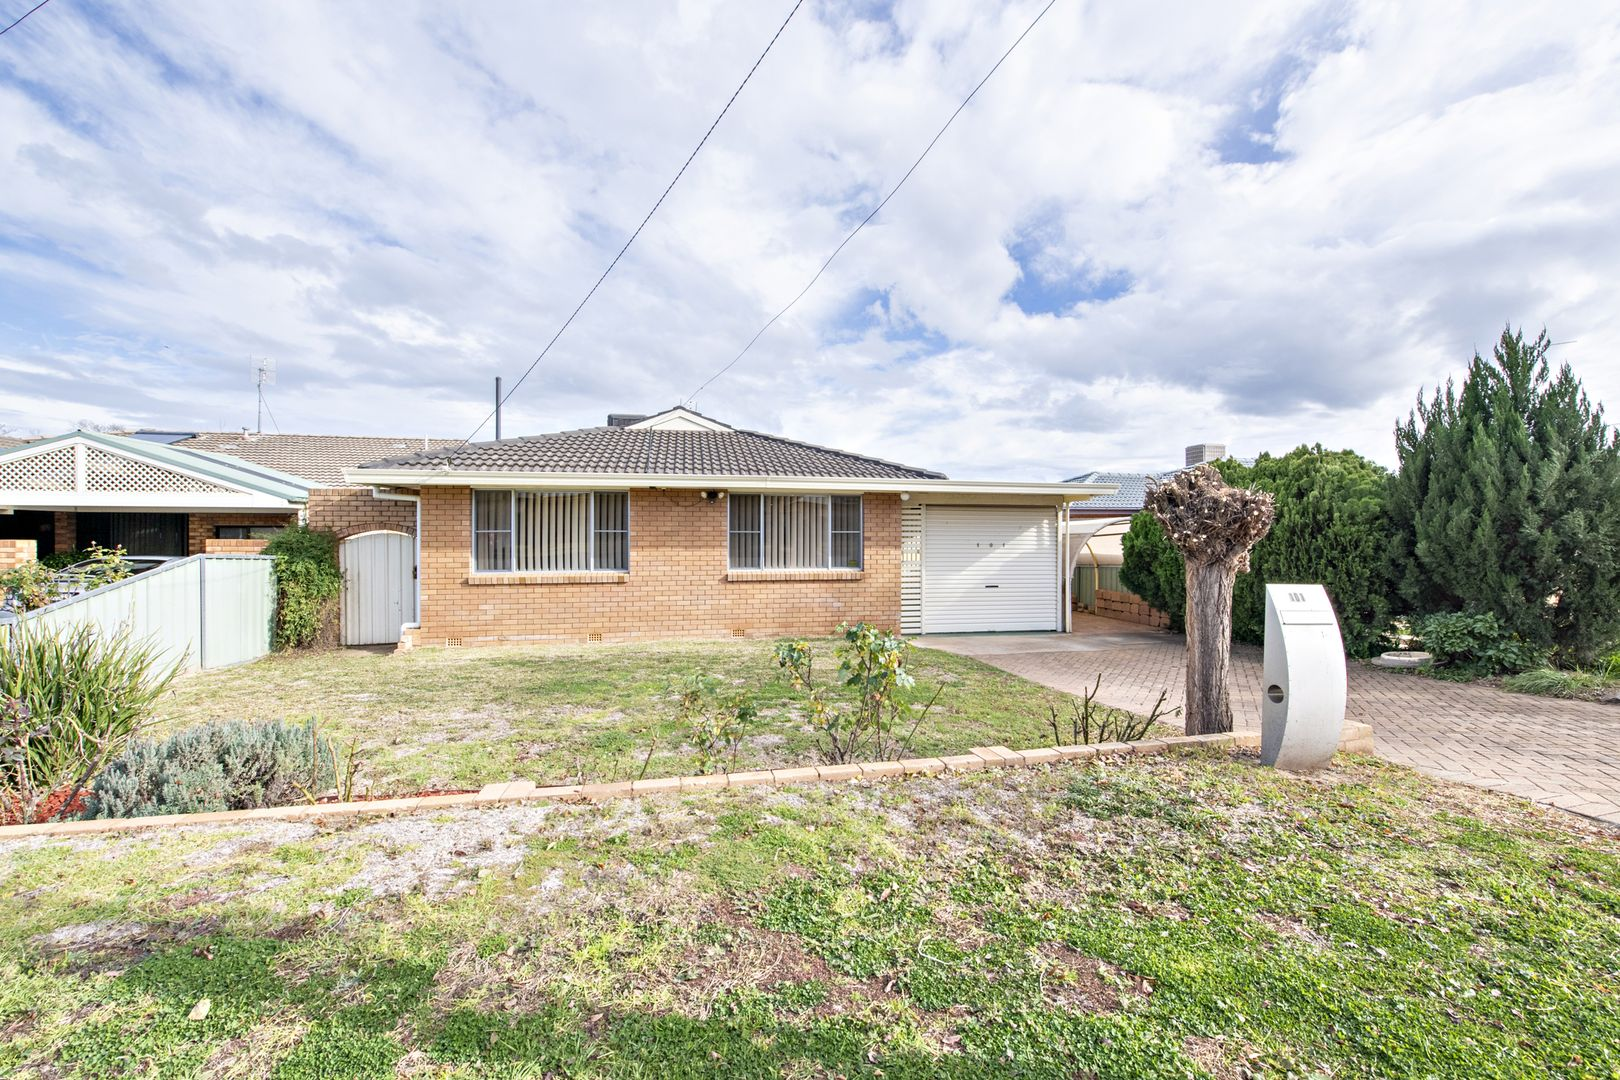 101 Dalton Street, Dubbo NSW 2830, Image 0